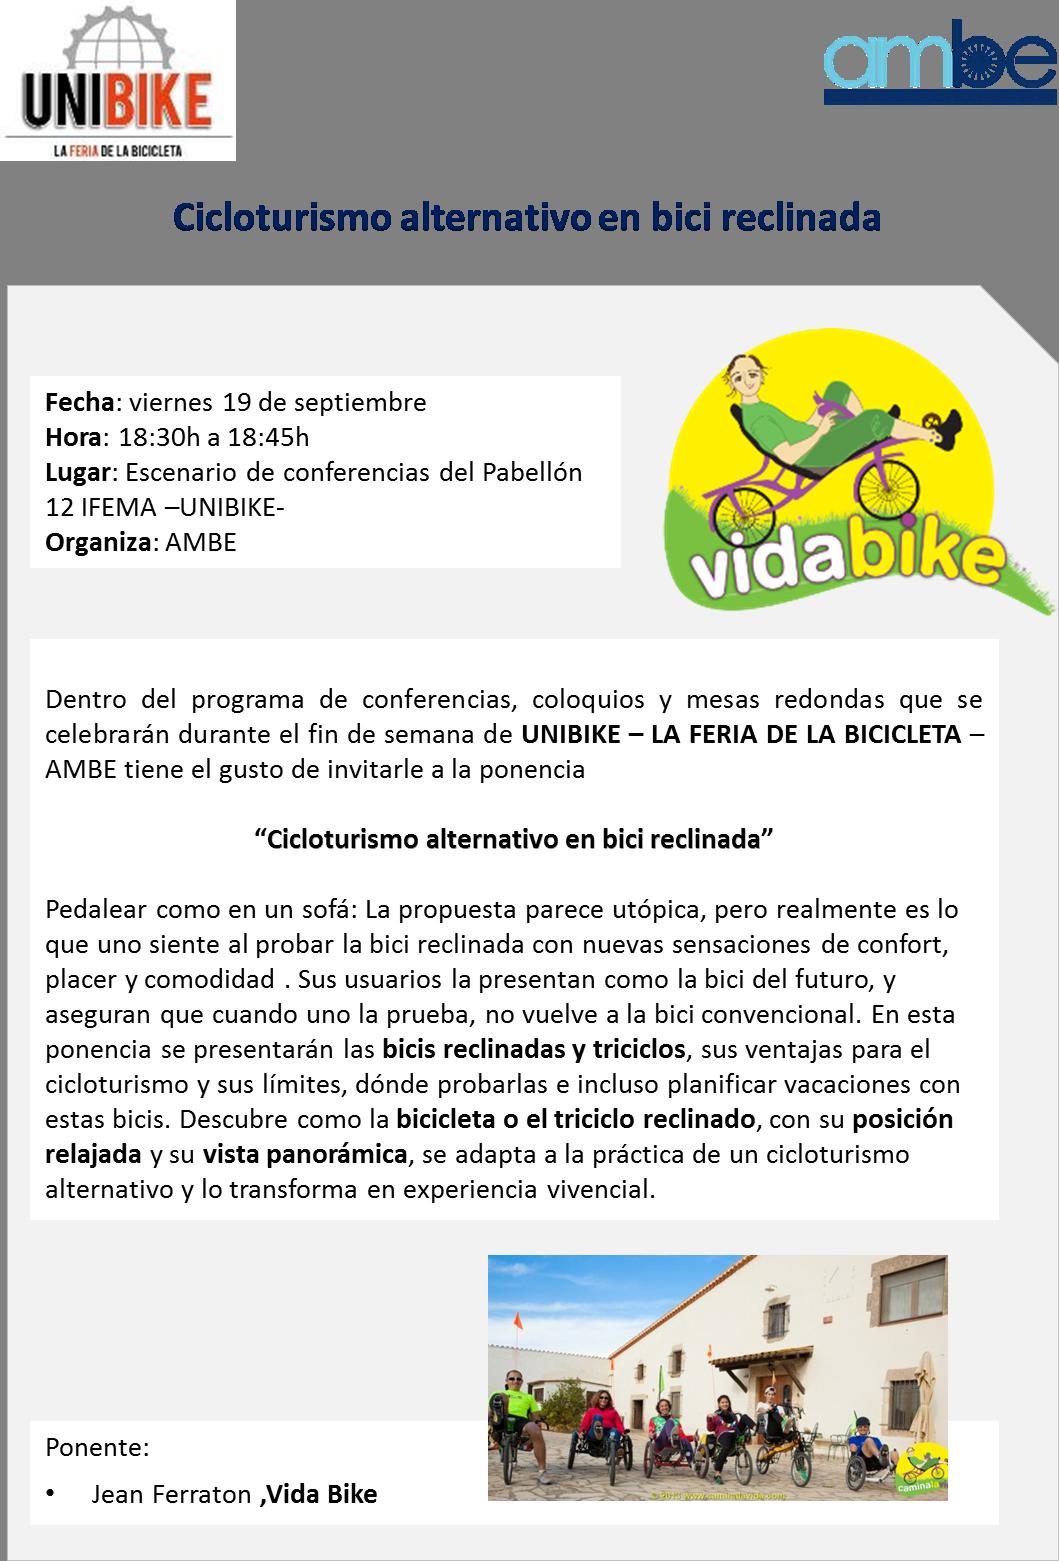 vidabike 1